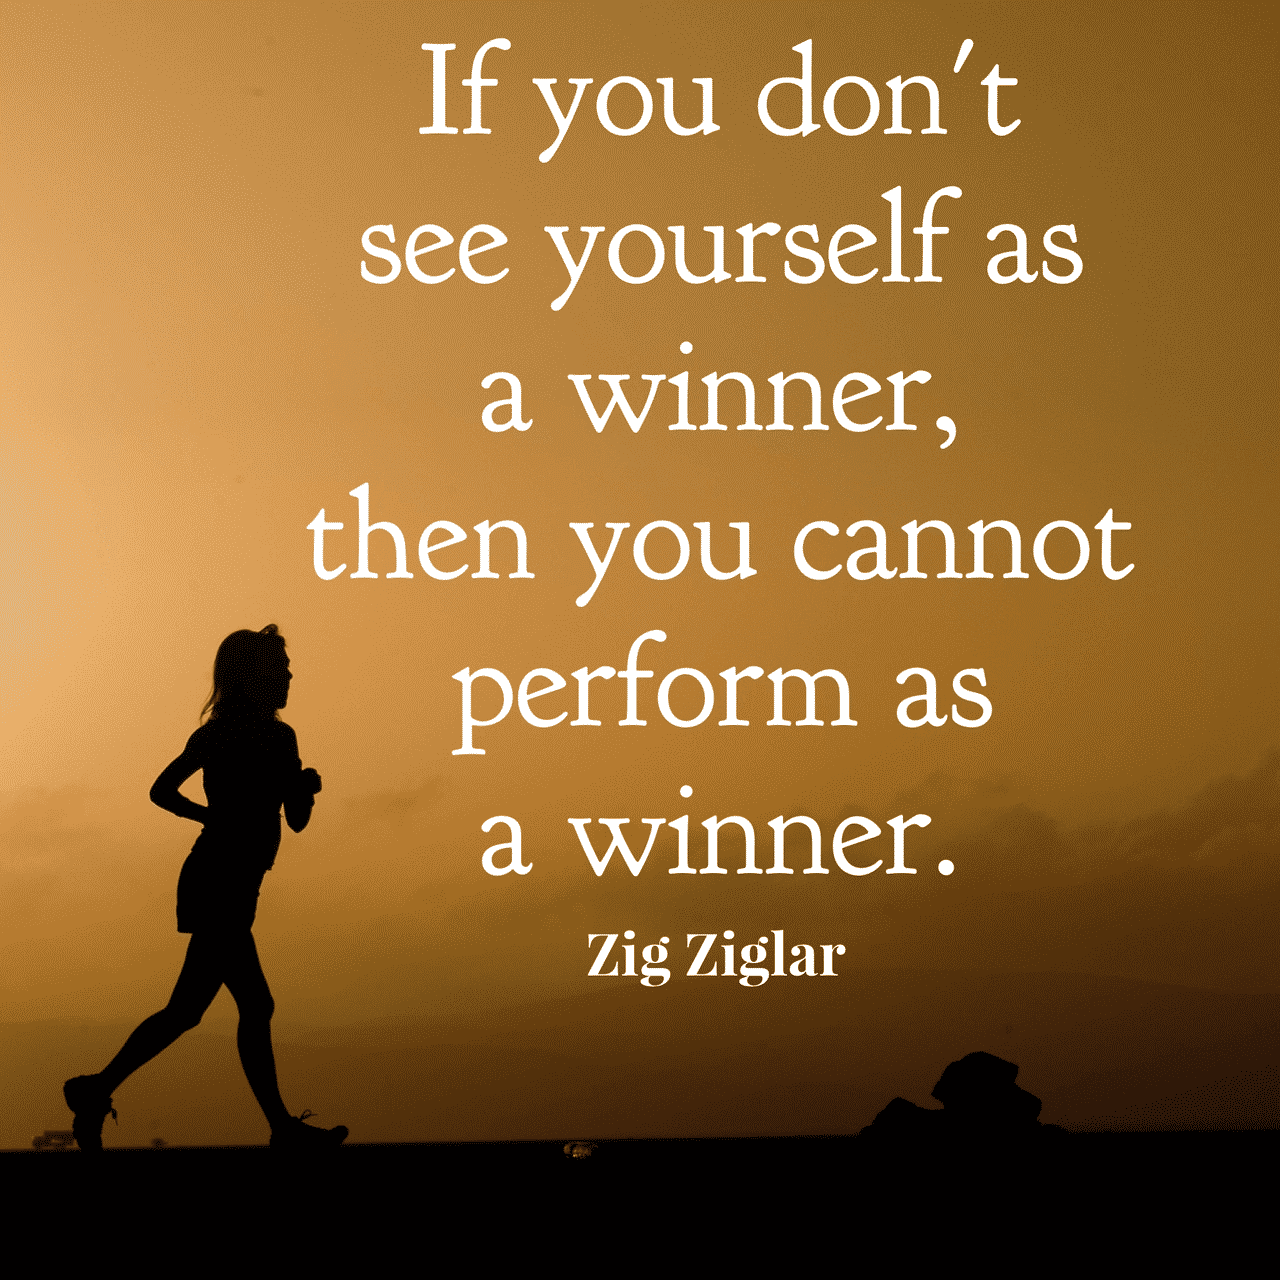 Zig Ziglar Quotes 25 Motivational Zig Ziglar Quotes Zig Ziglar Quotes